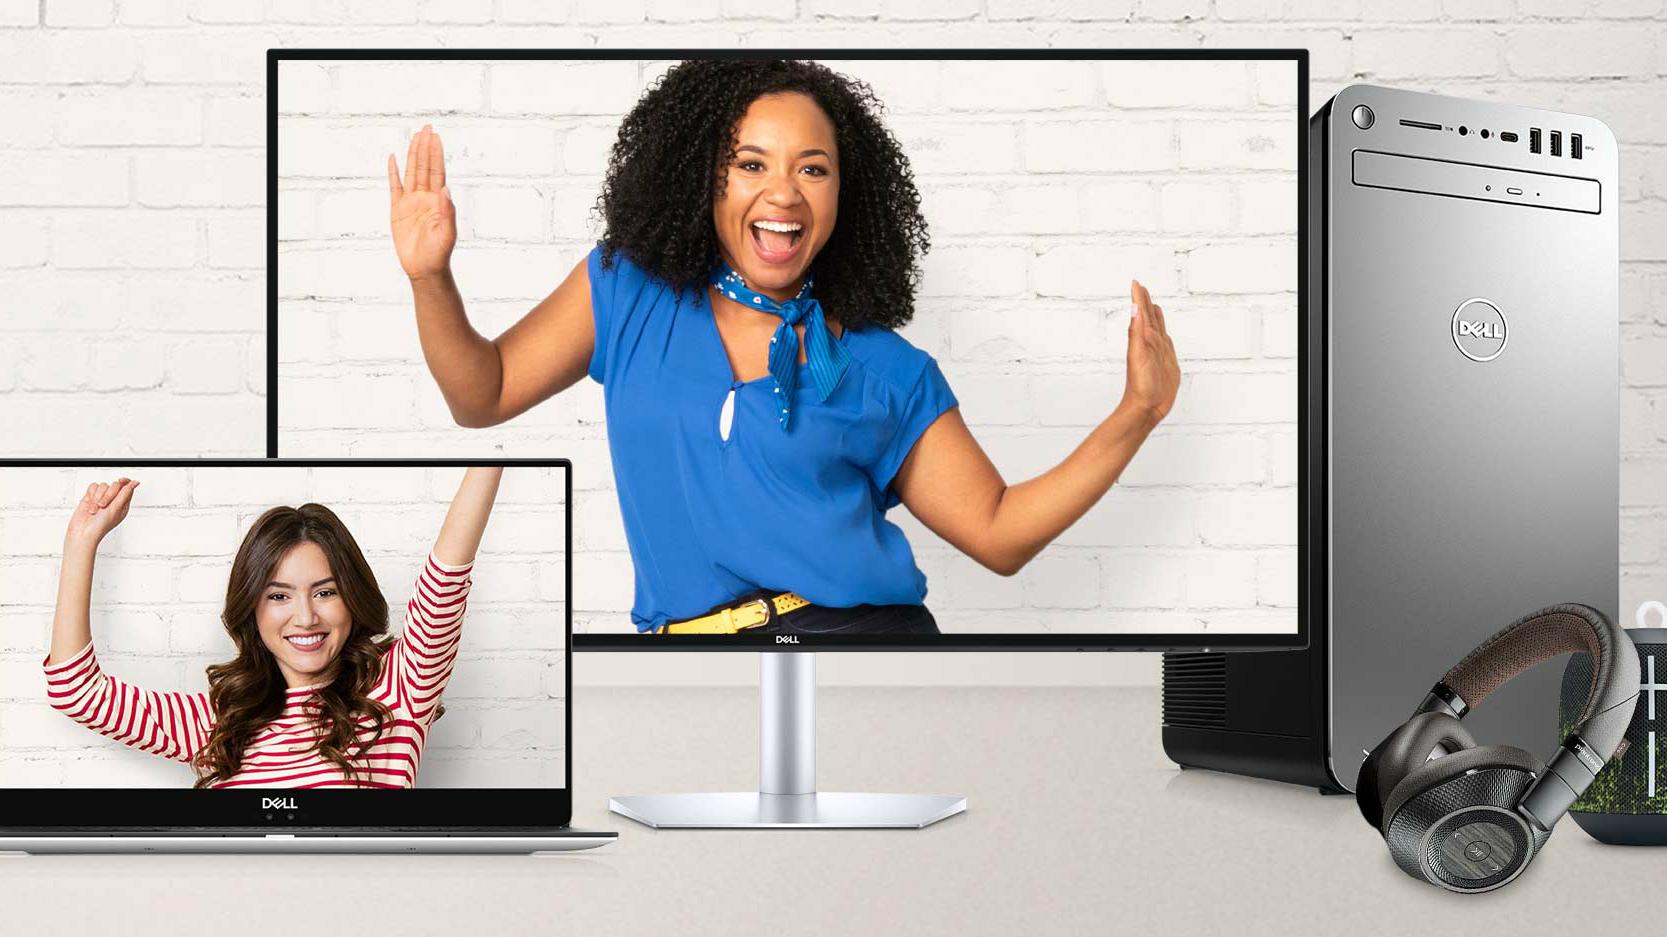 Dell Black Friday in July sale: deals on laptops, TVs, headphones